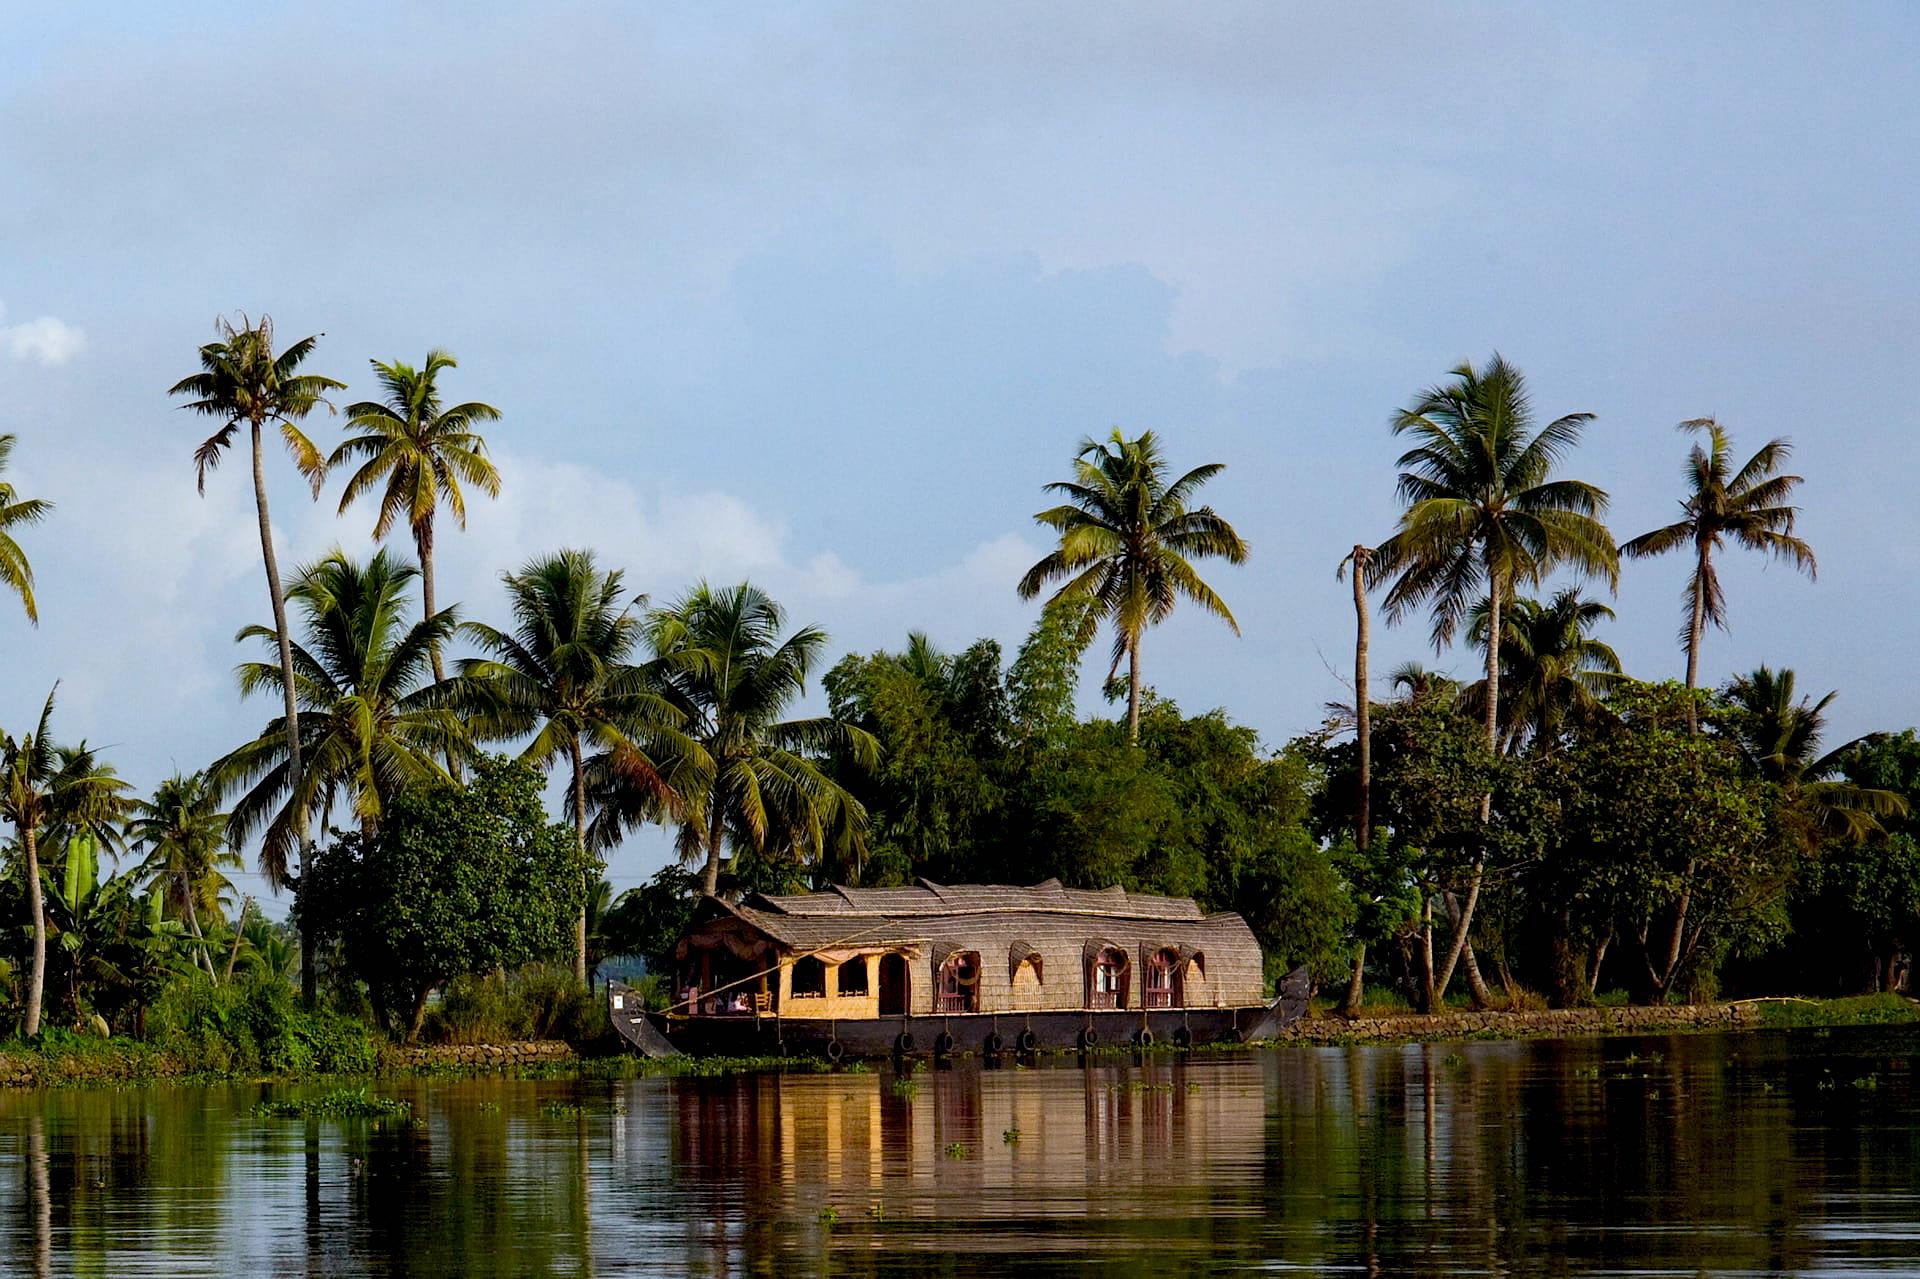 Adventour - India - Kerala backwaters houseboat